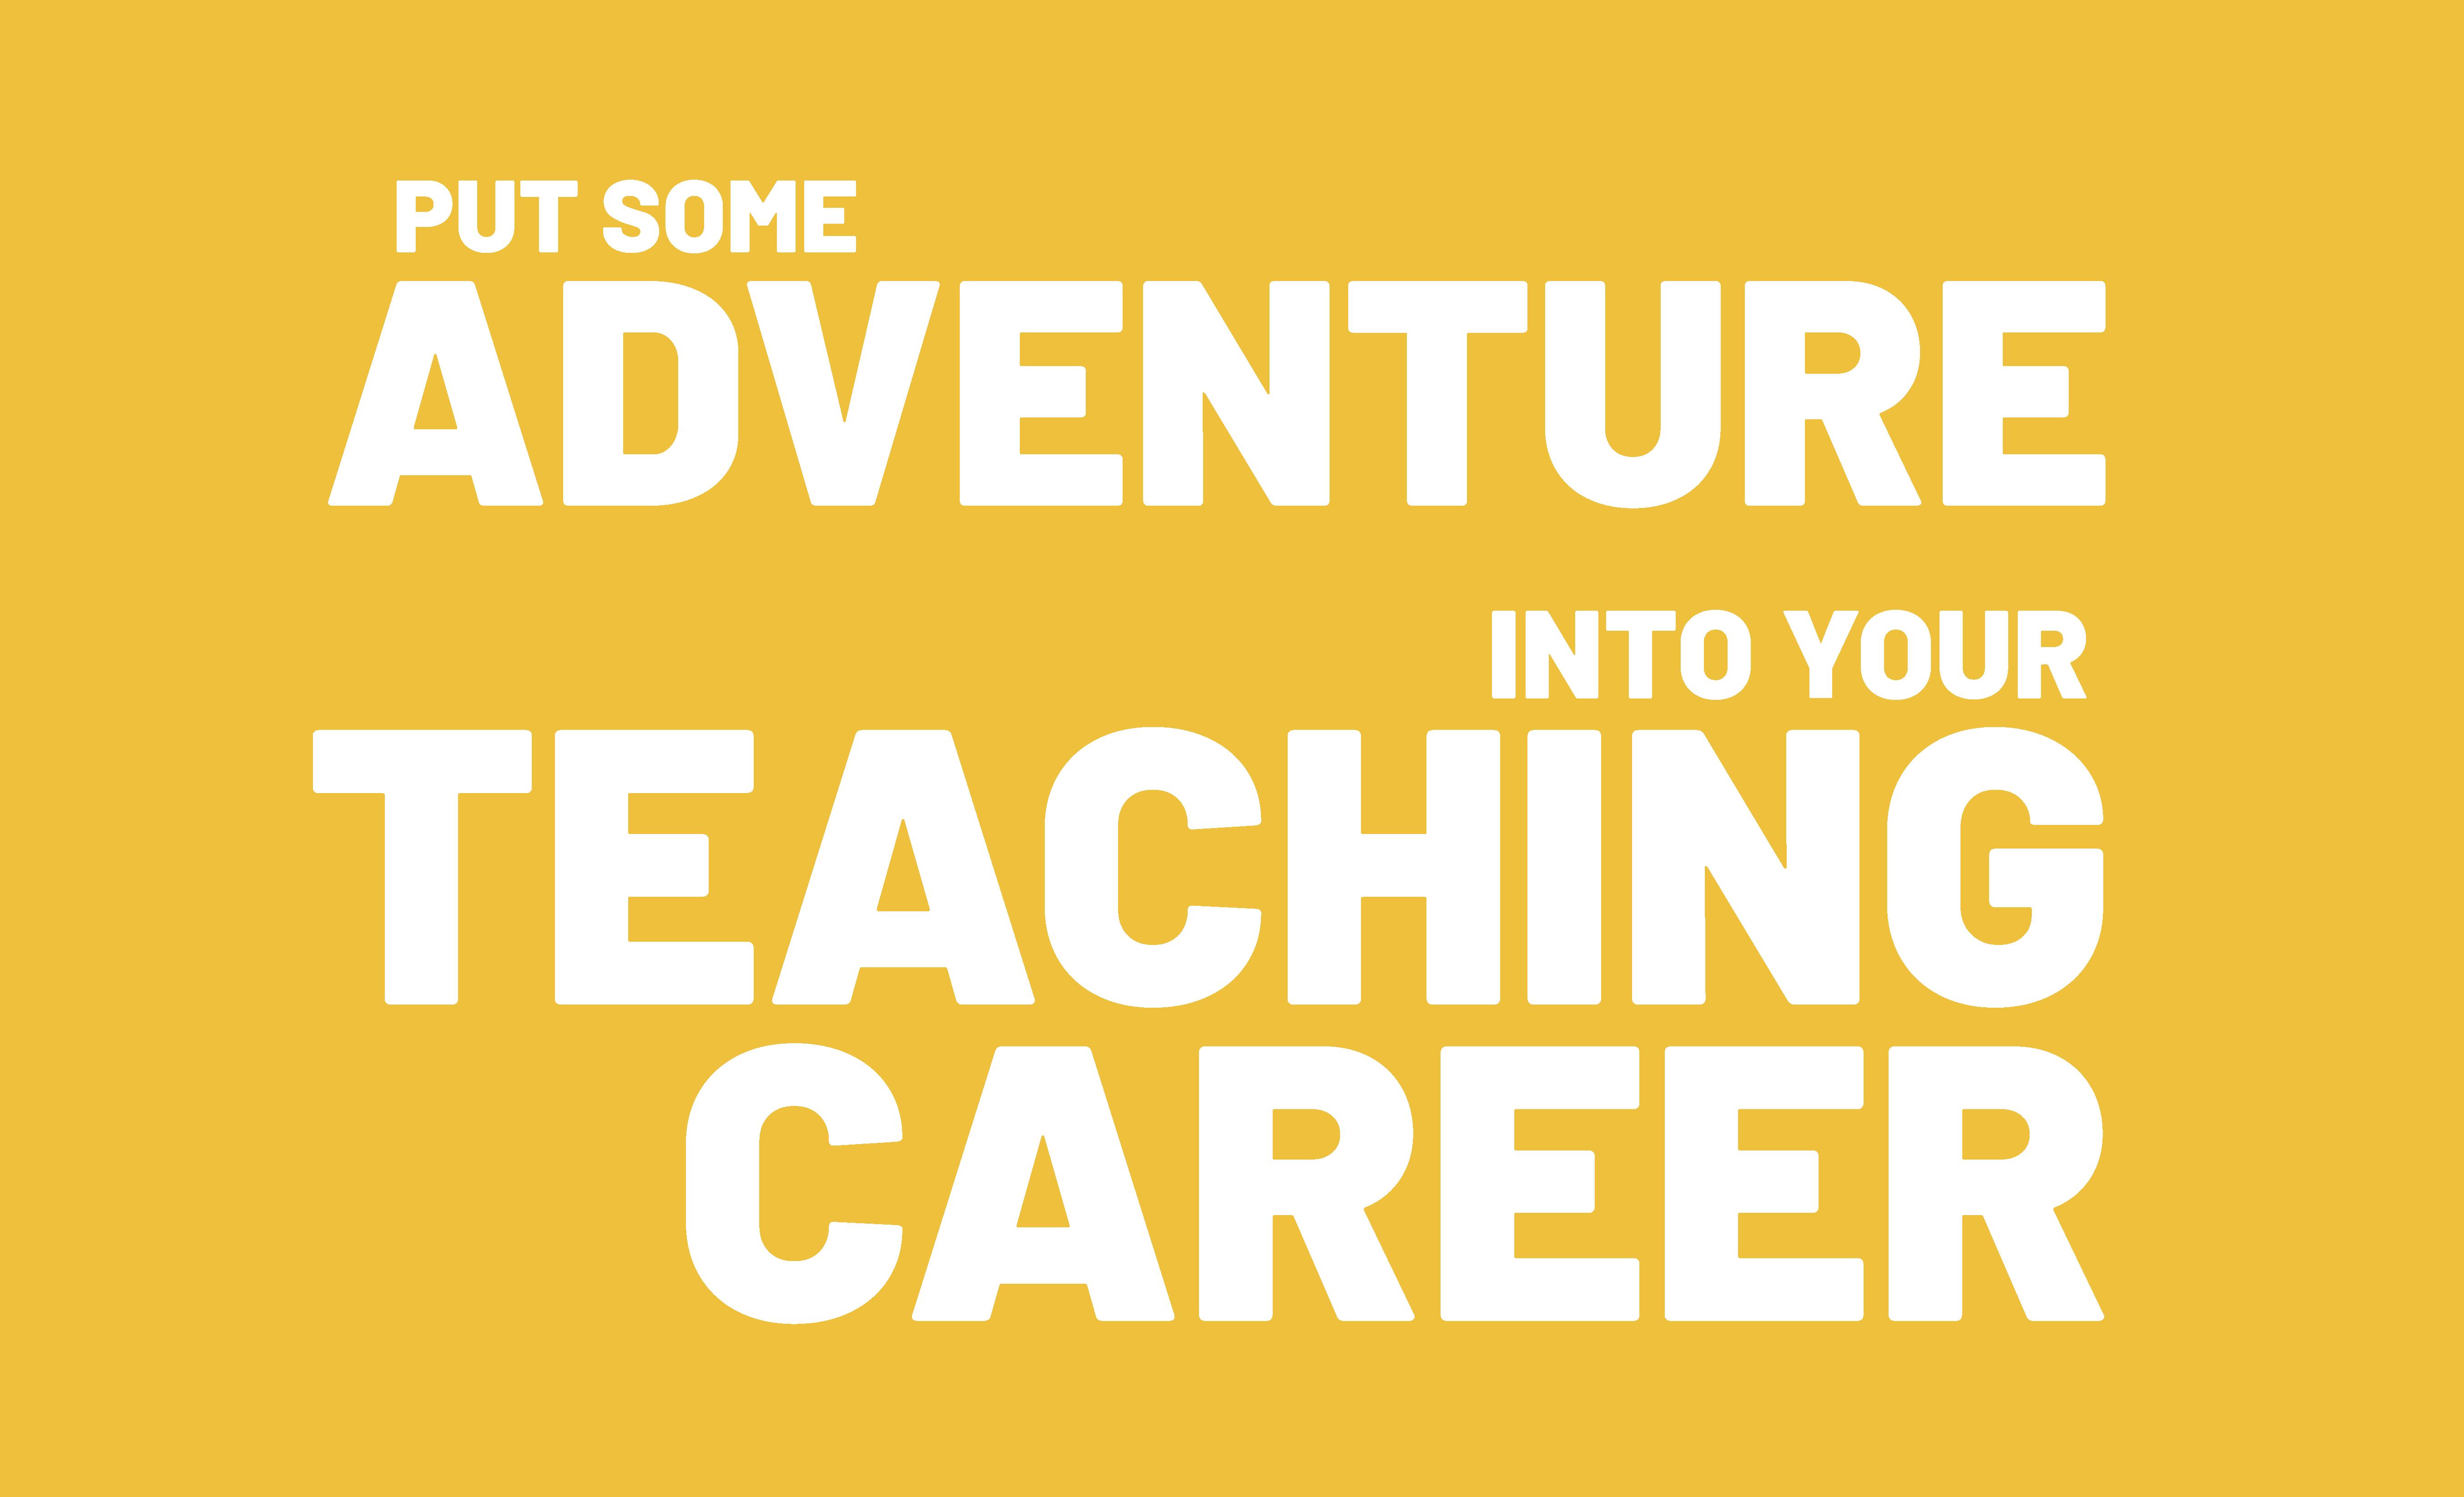 St Barbara's Parish School teaching career